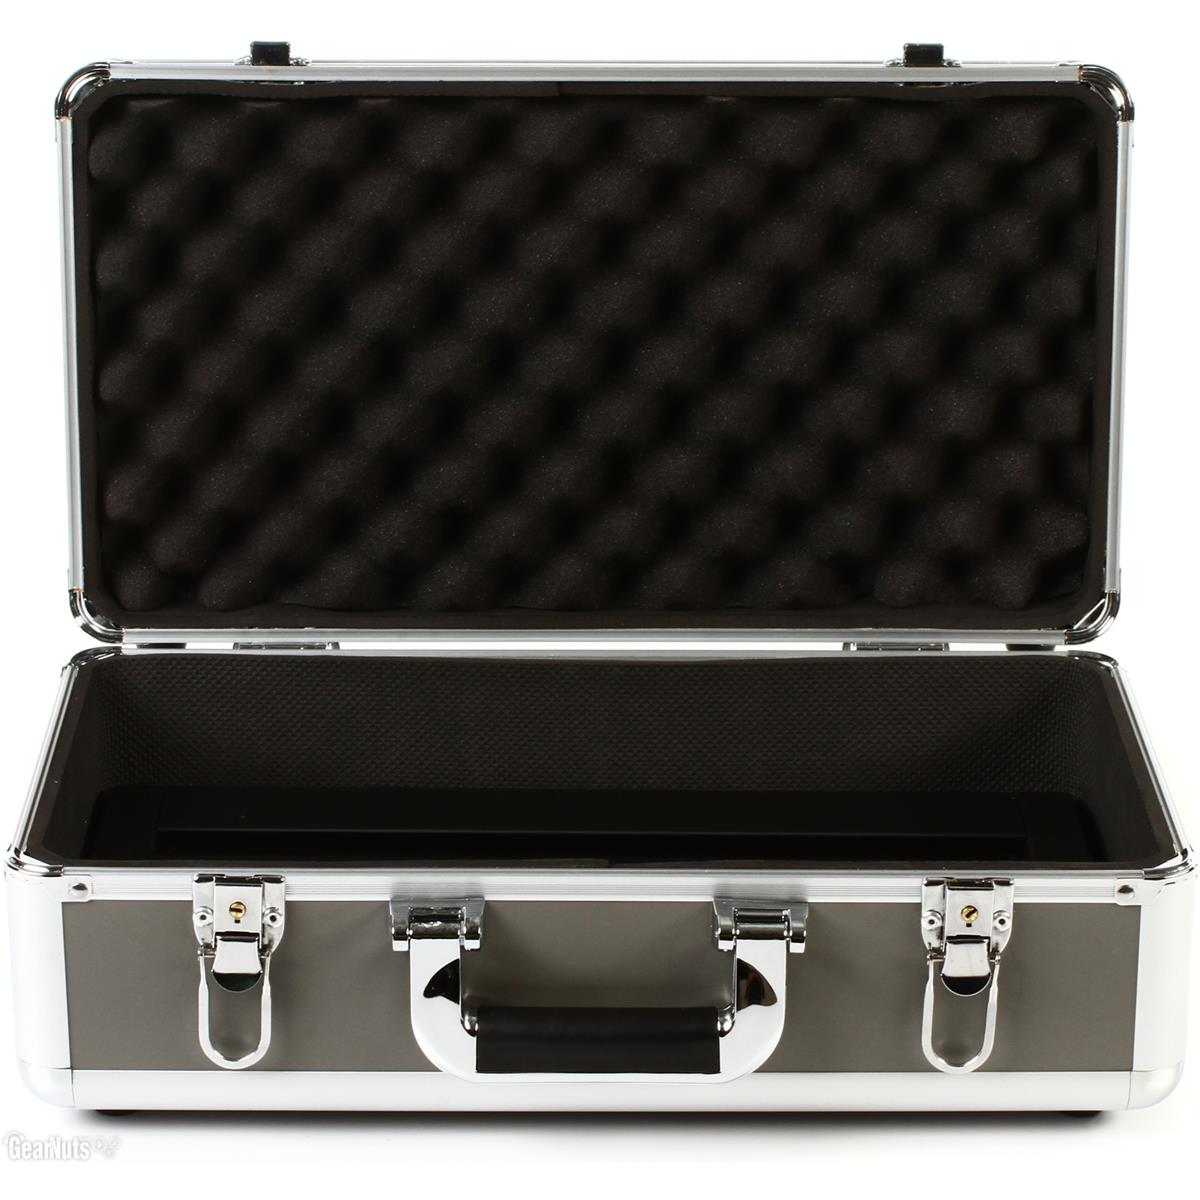 PEDALTRAIN-METRO-16-HARD-CASE-pedal-board-sku-14717